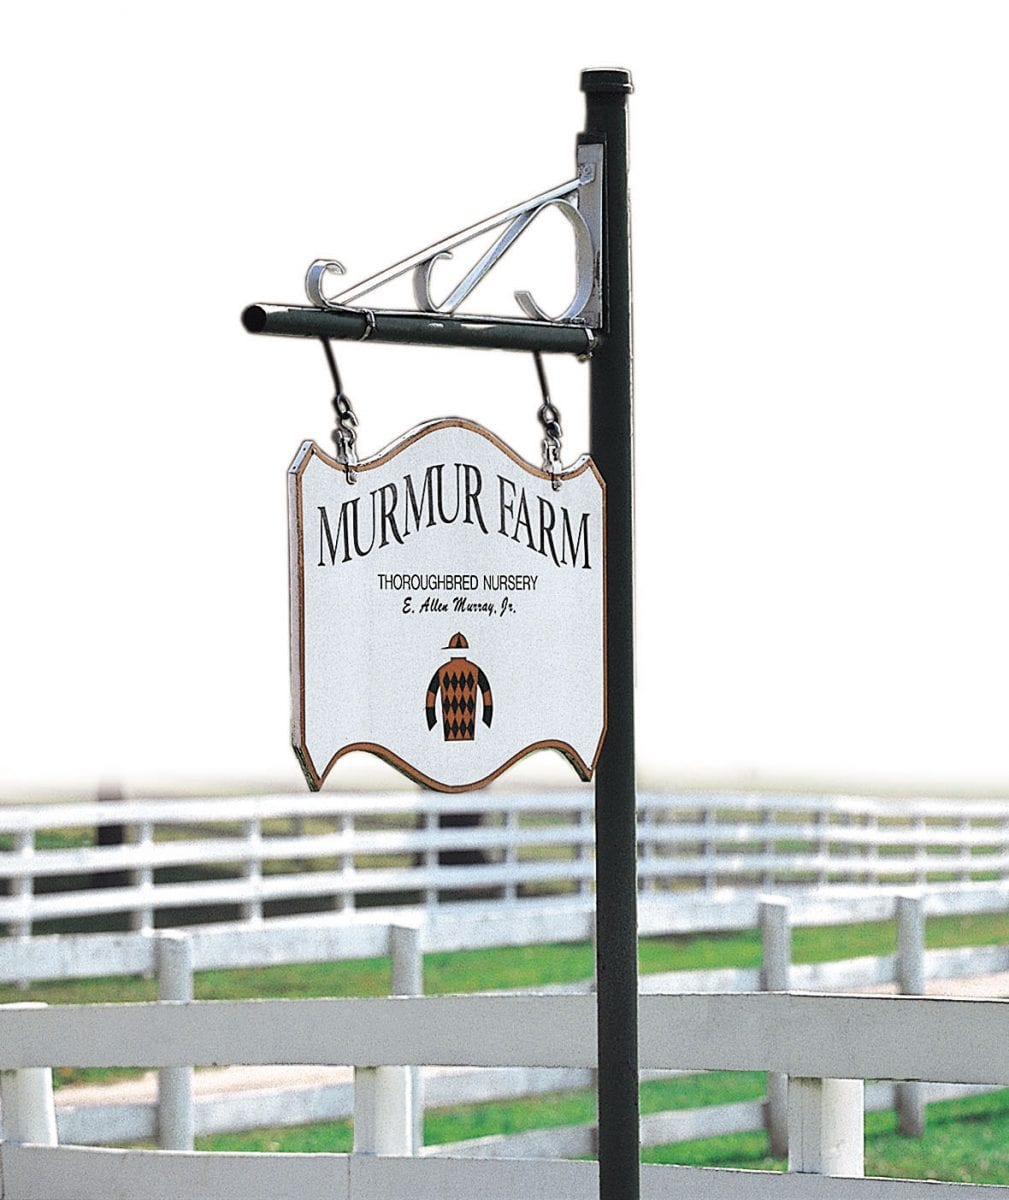 Veteran stallion Petionville moves to Murmur Farm